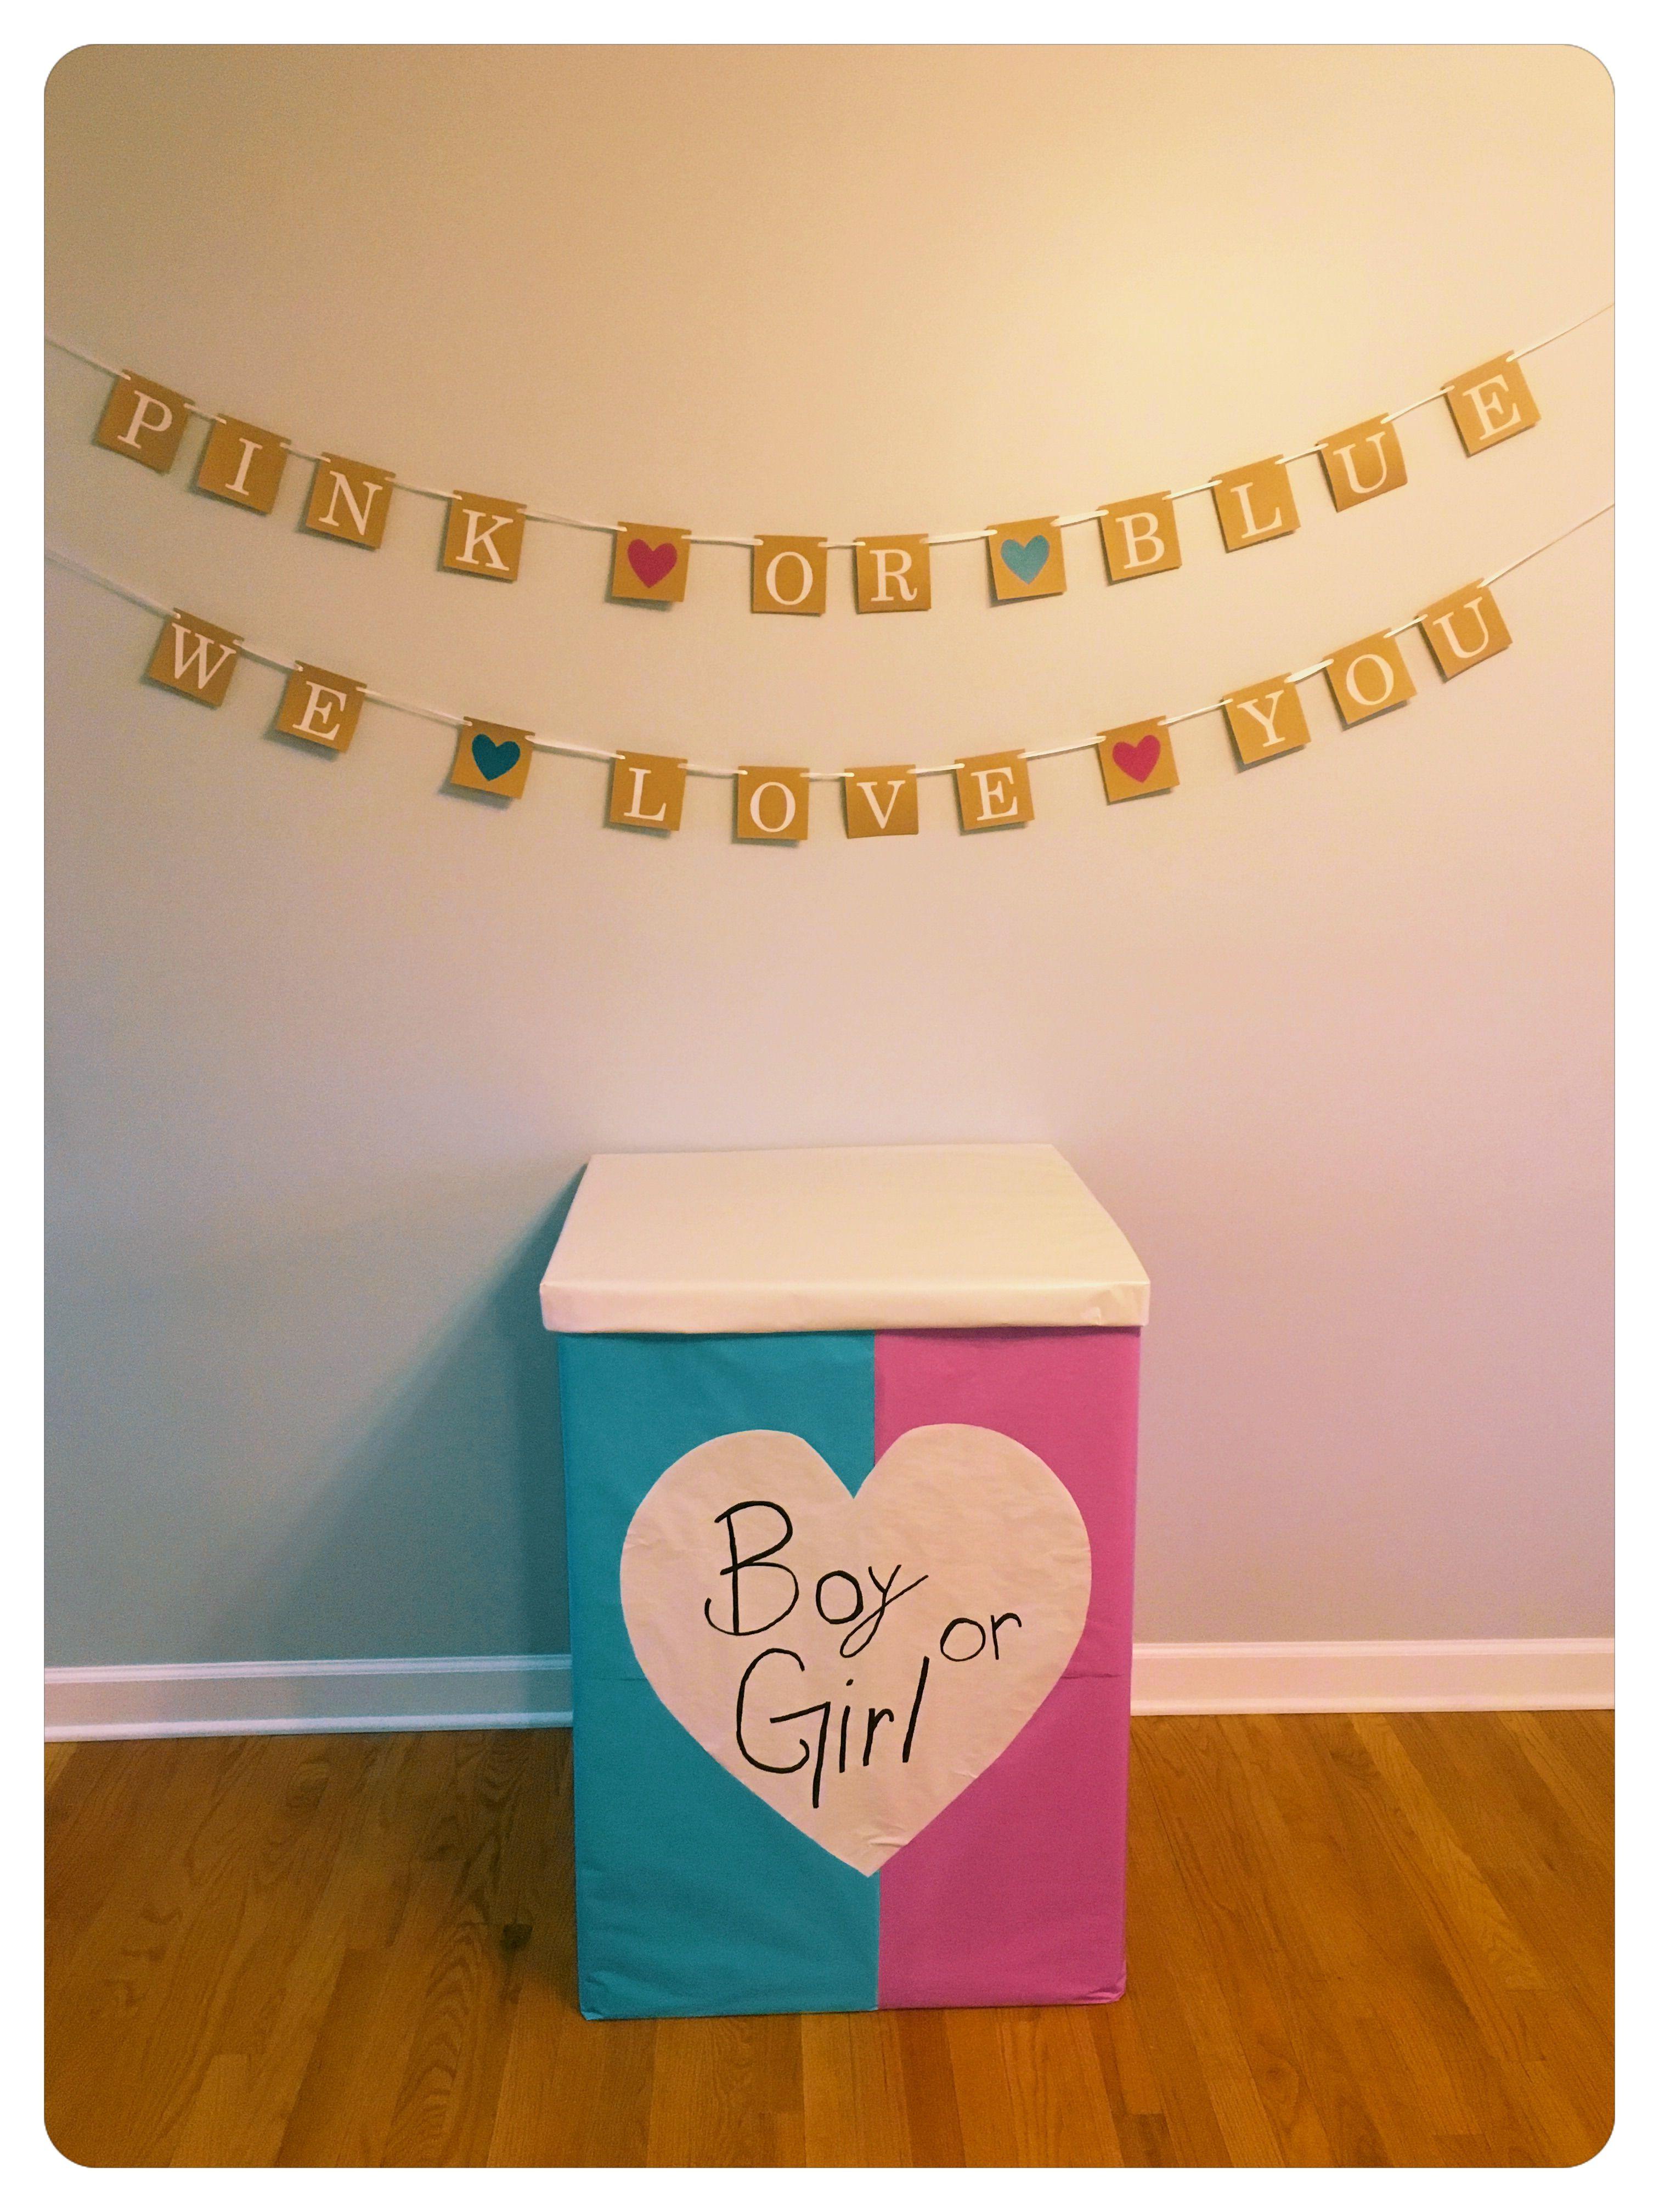 My Gender Reveal Balloon Box Boy Or Girl Punk Or Blue Gender Reveal Balloon Box Balloon Reveal Gender Reveal Balloon Box Gender Reveal Balloons Balloon Box